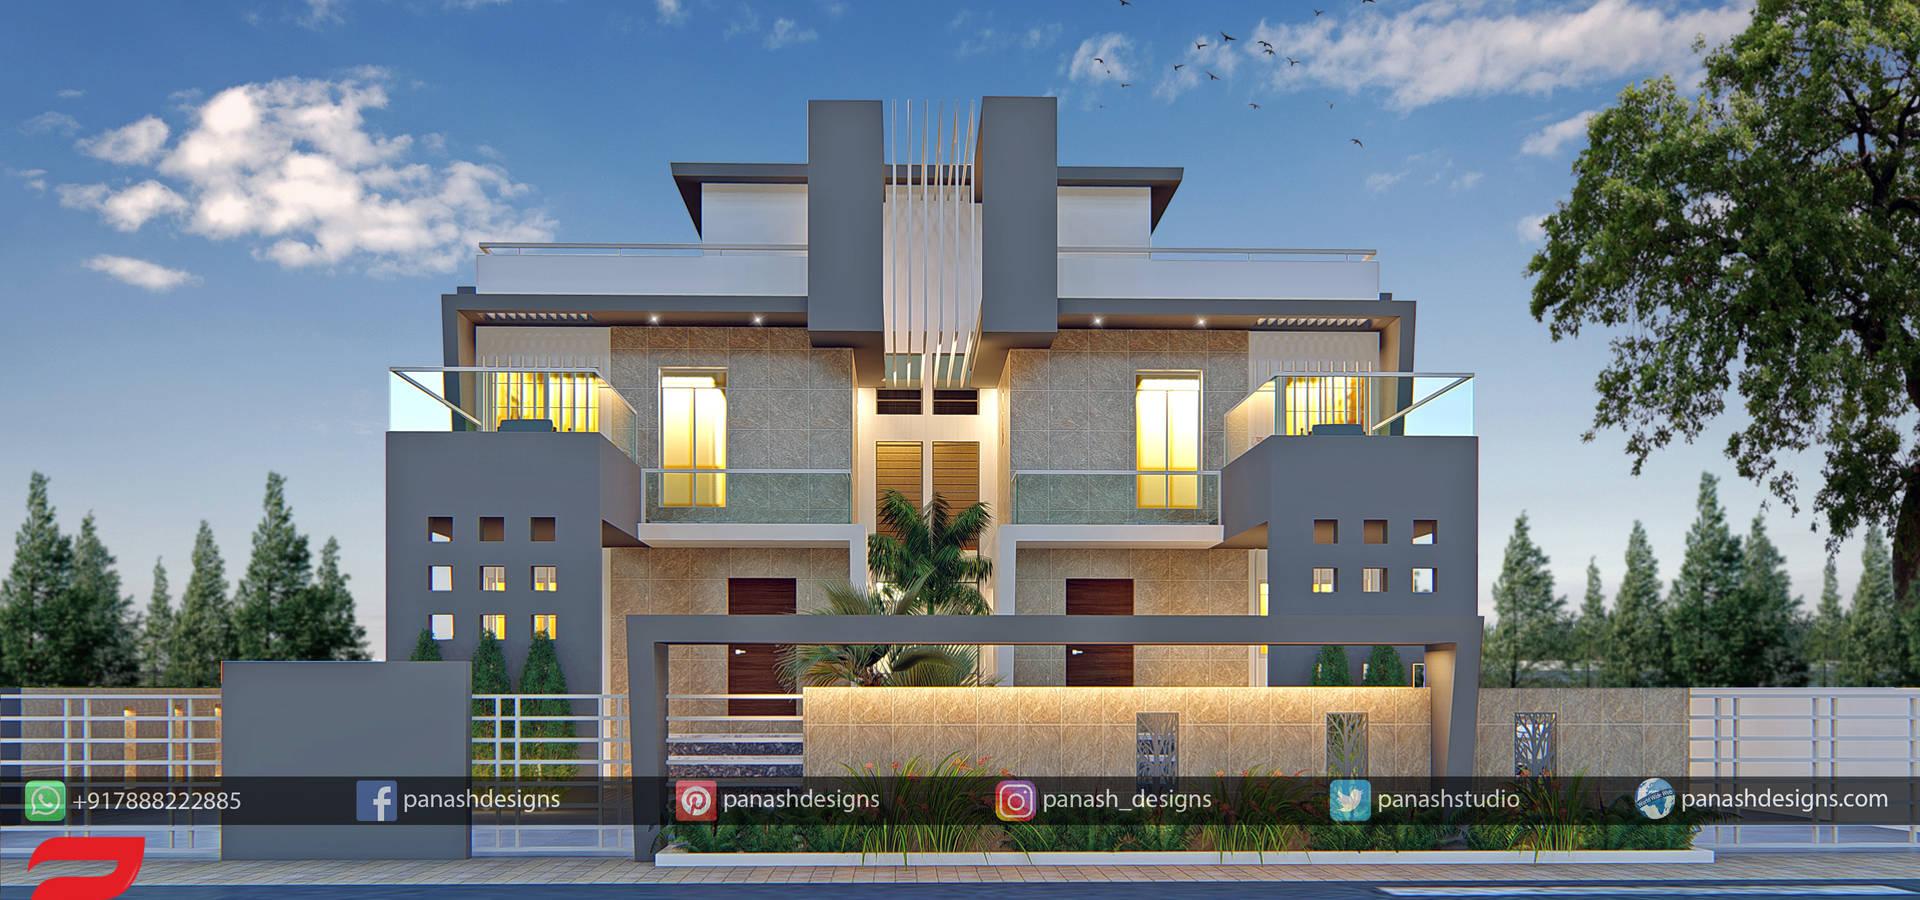 Panash Design Studio